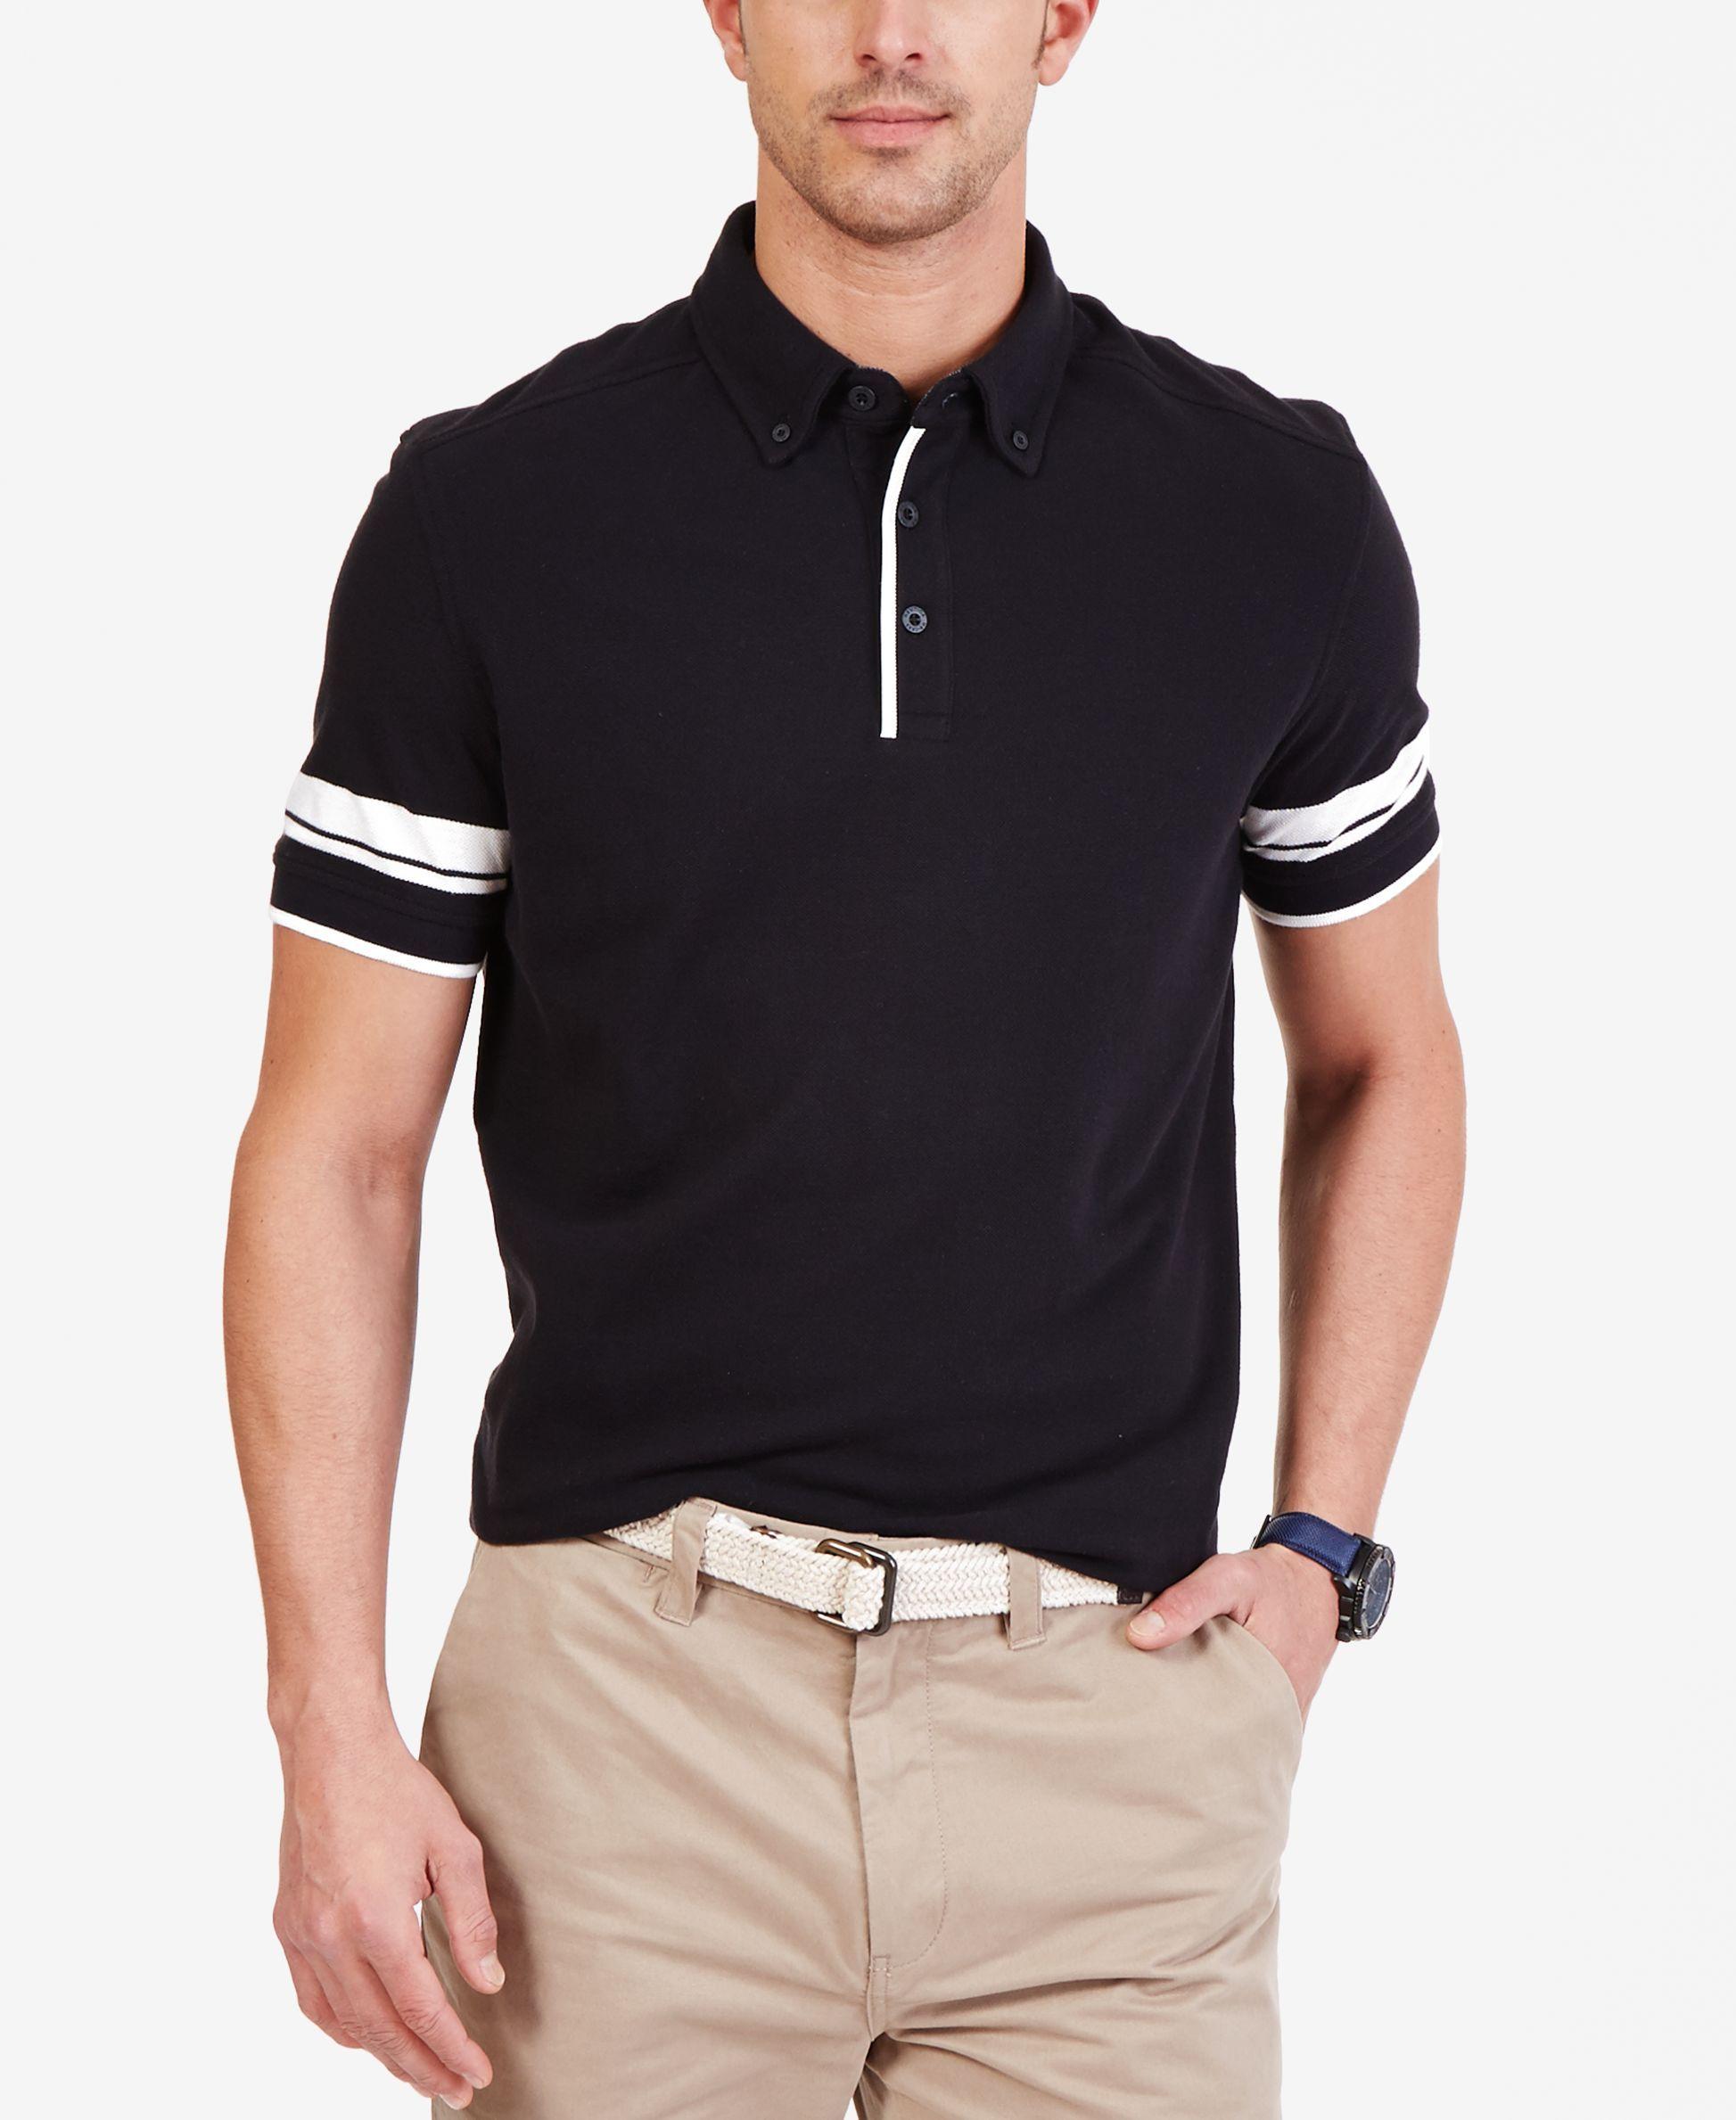 Nautica Mens Striped Sleeve Polo Shirt Dodgy Inspiration Shirts